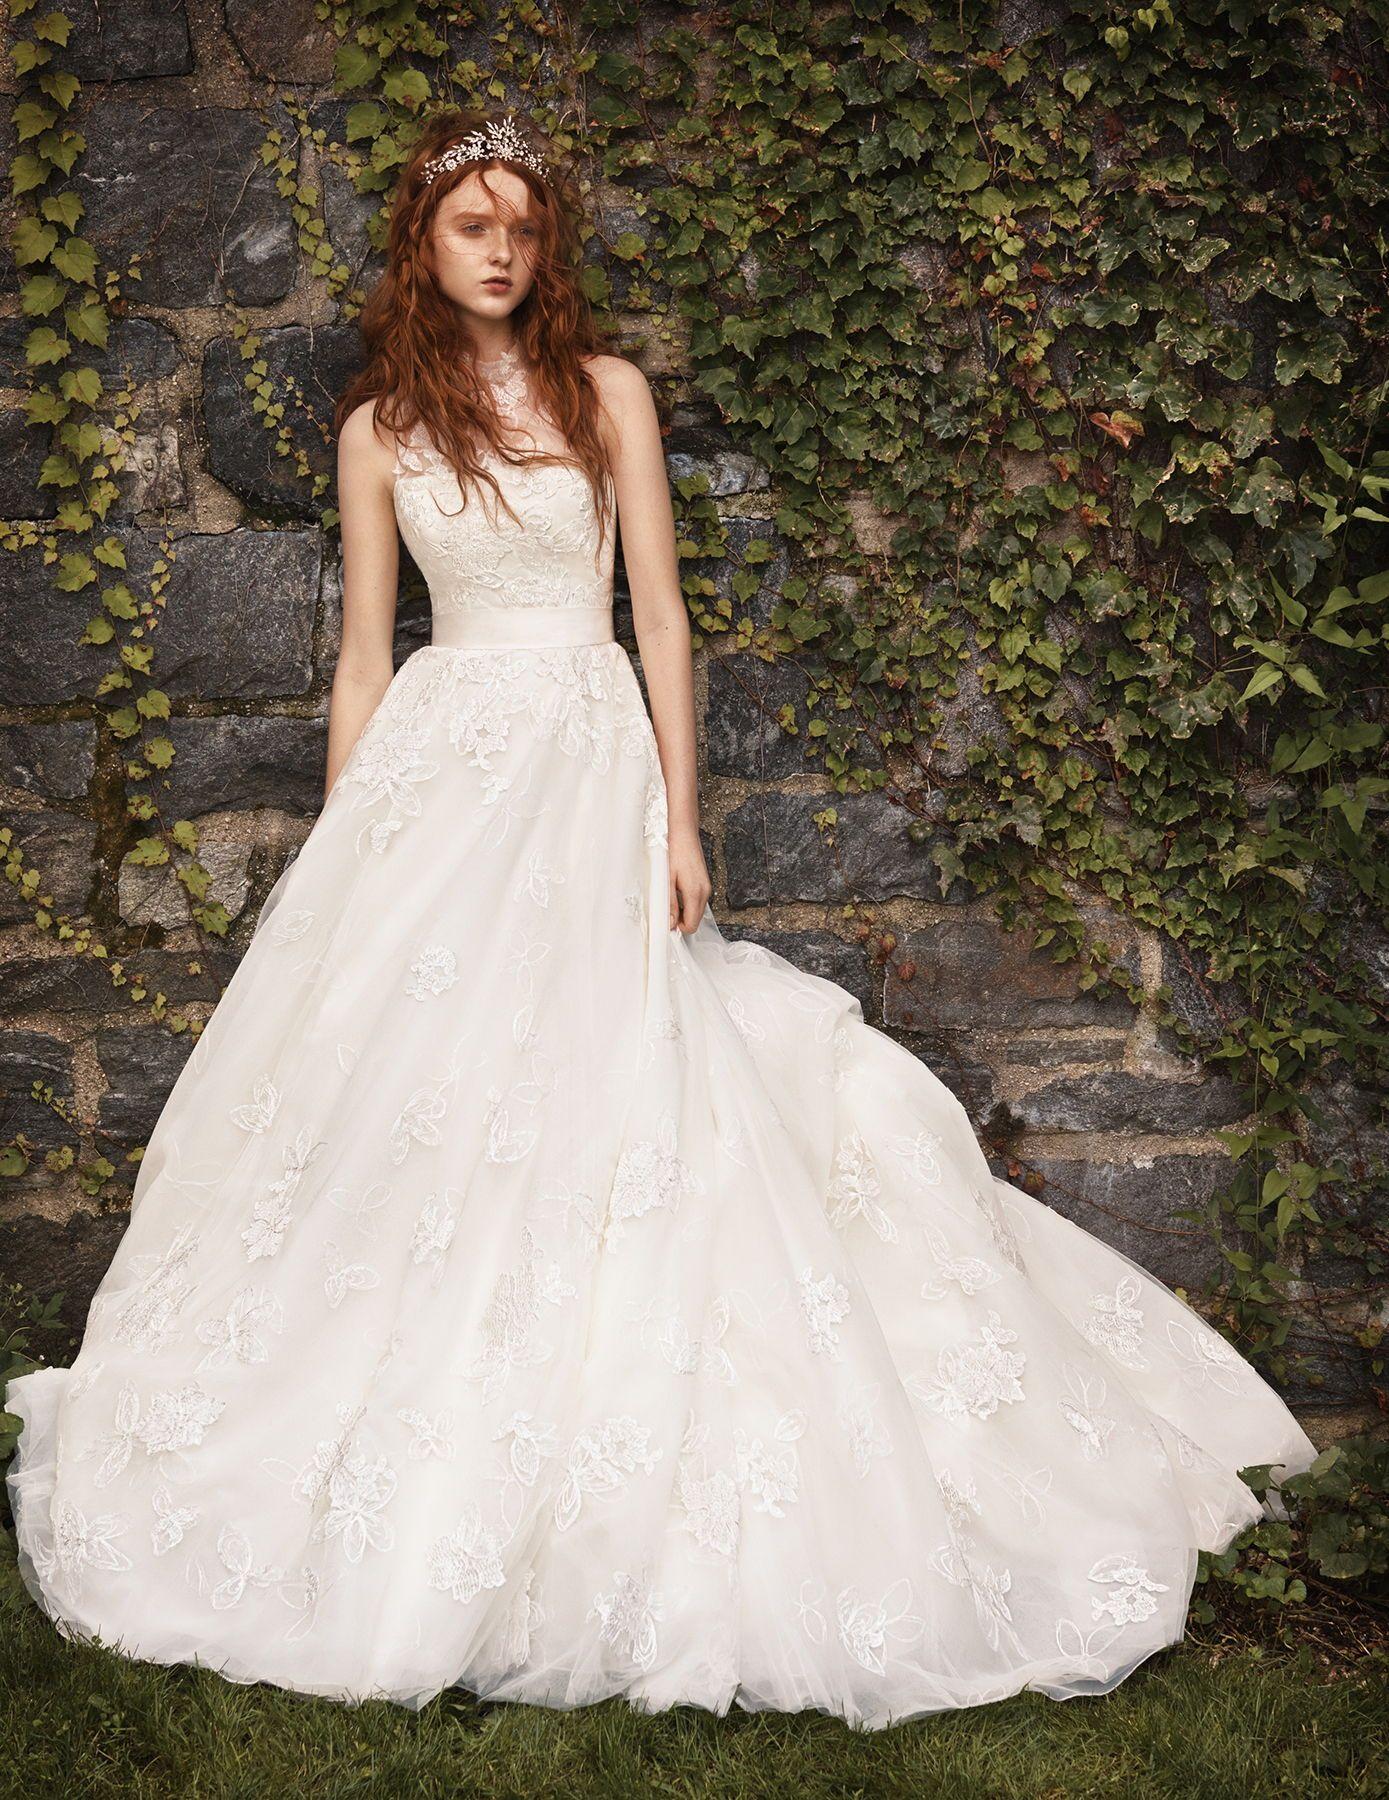 White By Vera Wang Illusion Floral Wedding Dress David S Bridal Wedding Dresses Vera Wang Designer Wedding Dresses Vera Wang Floral Wedding Dress [ 1800 x 1389 Pixel ]